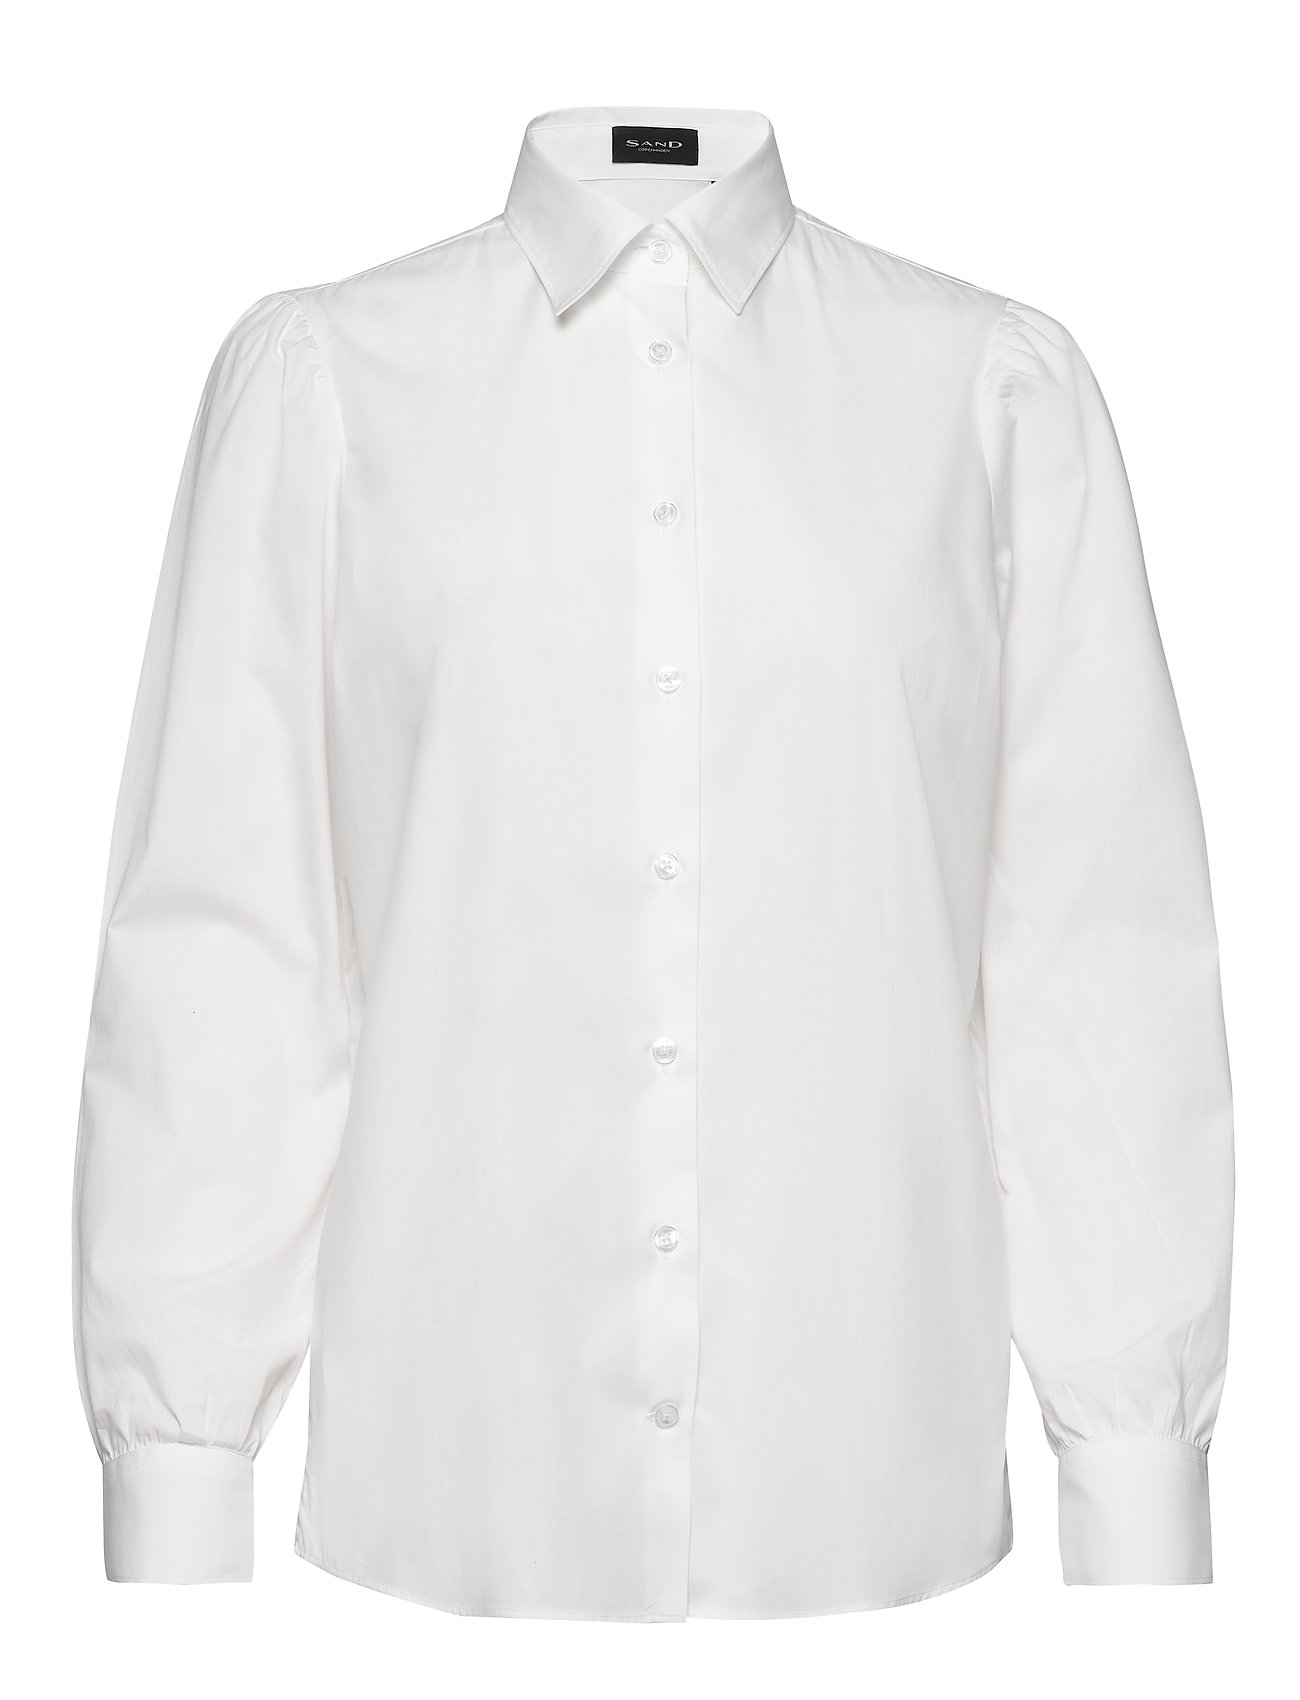 SAND - 8704 - Loreto - overhemden met lange mouwen - optical white - 0